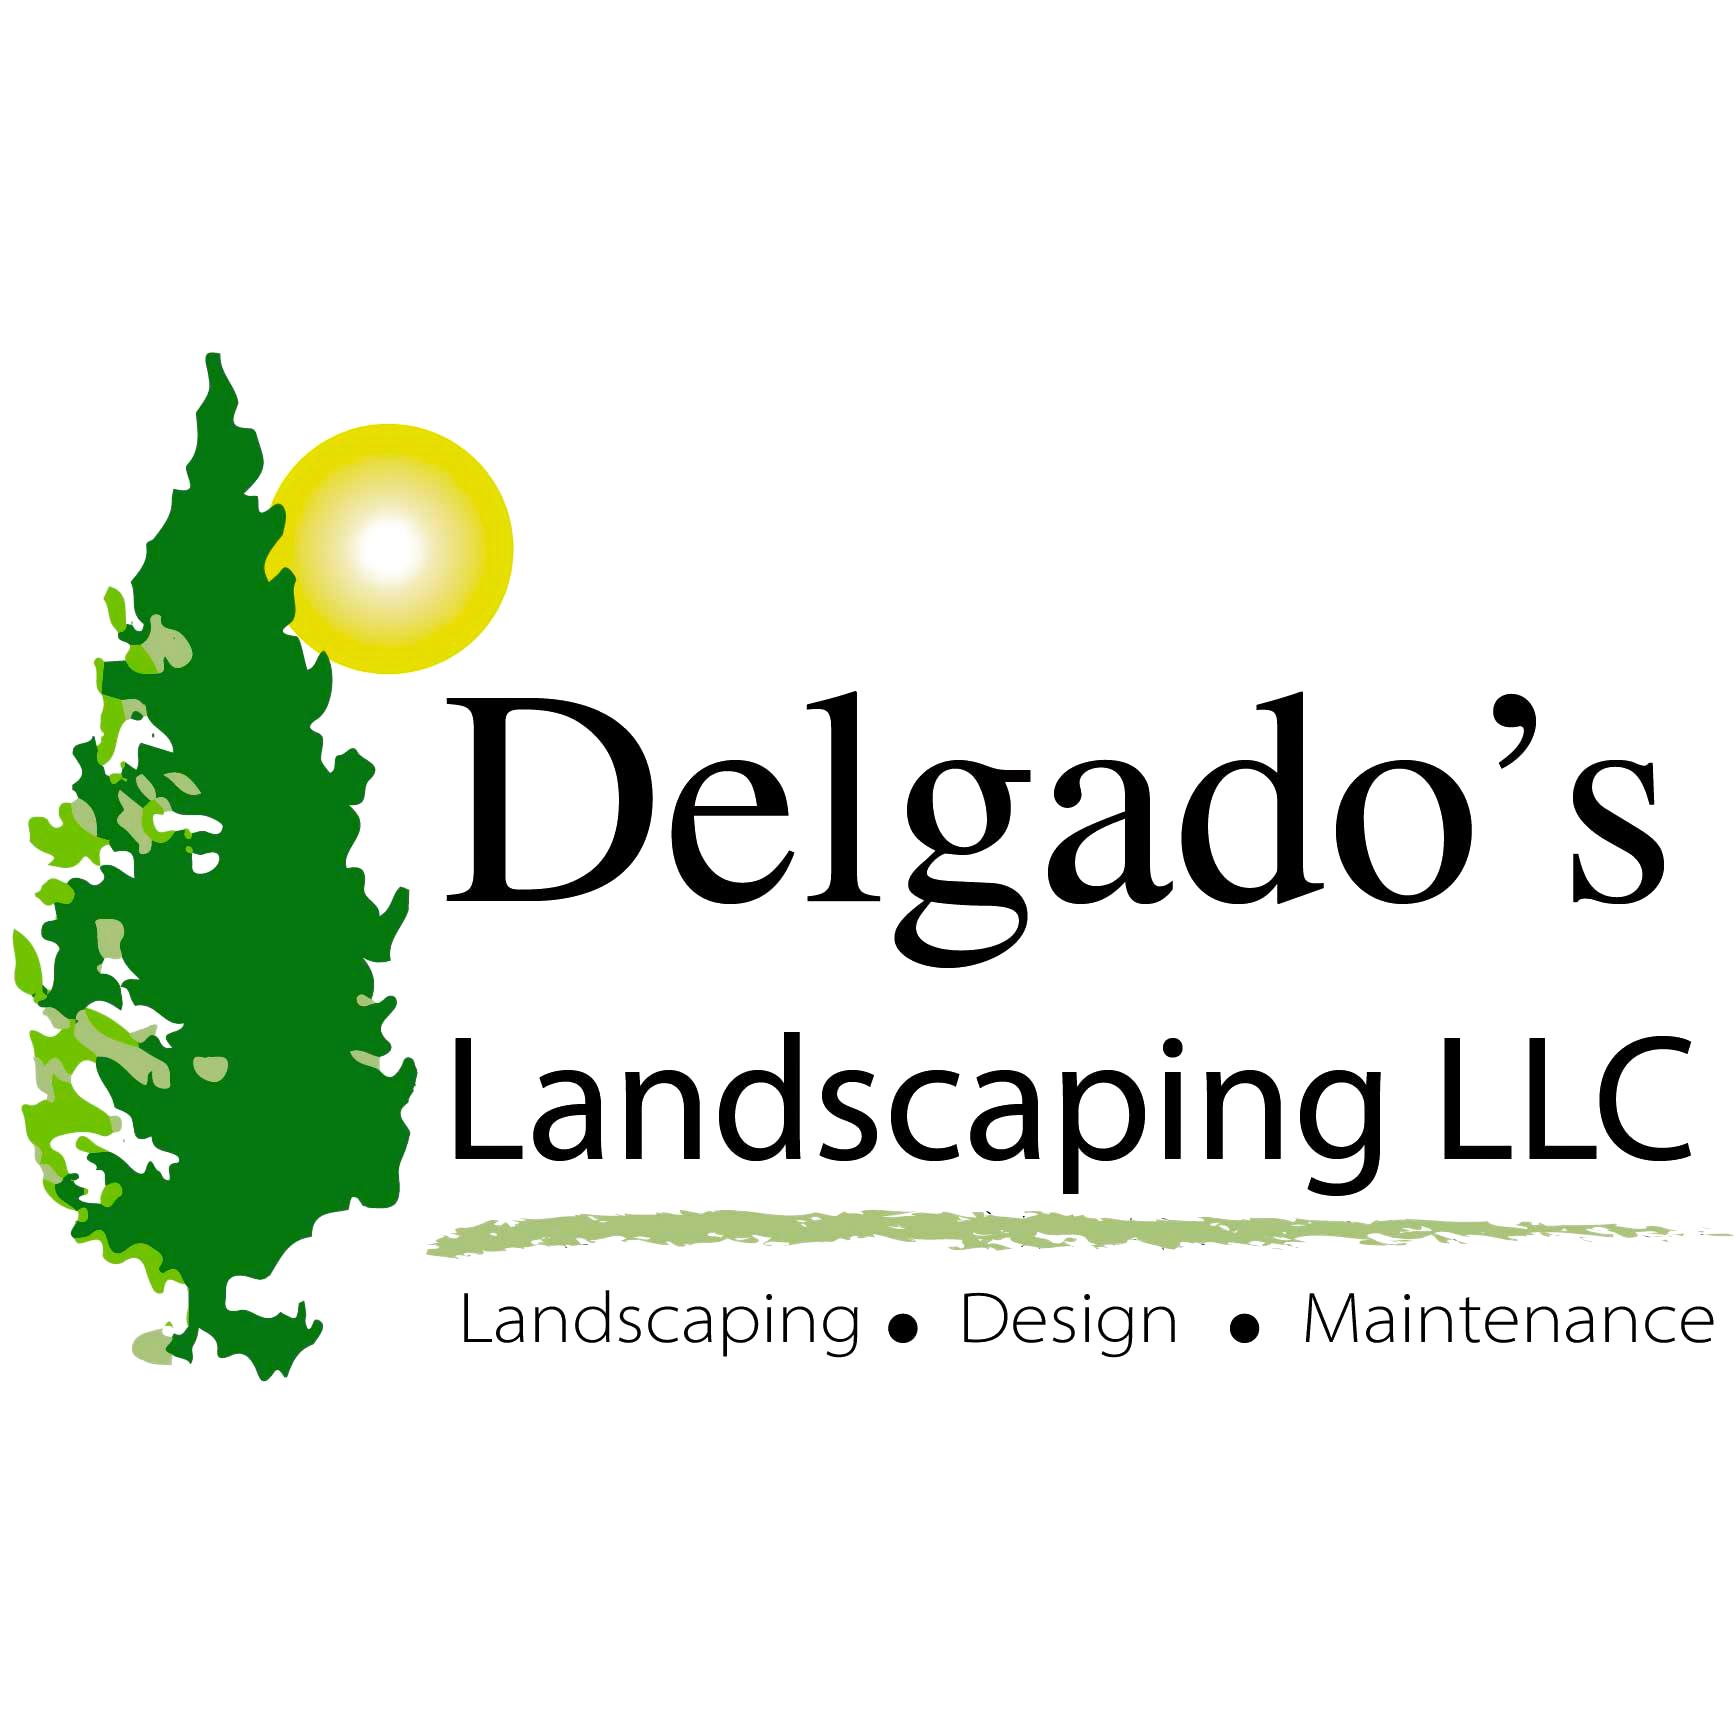 Delgado's Landscaping,LLC - Anaheim, CA - Landscape Architects & Design